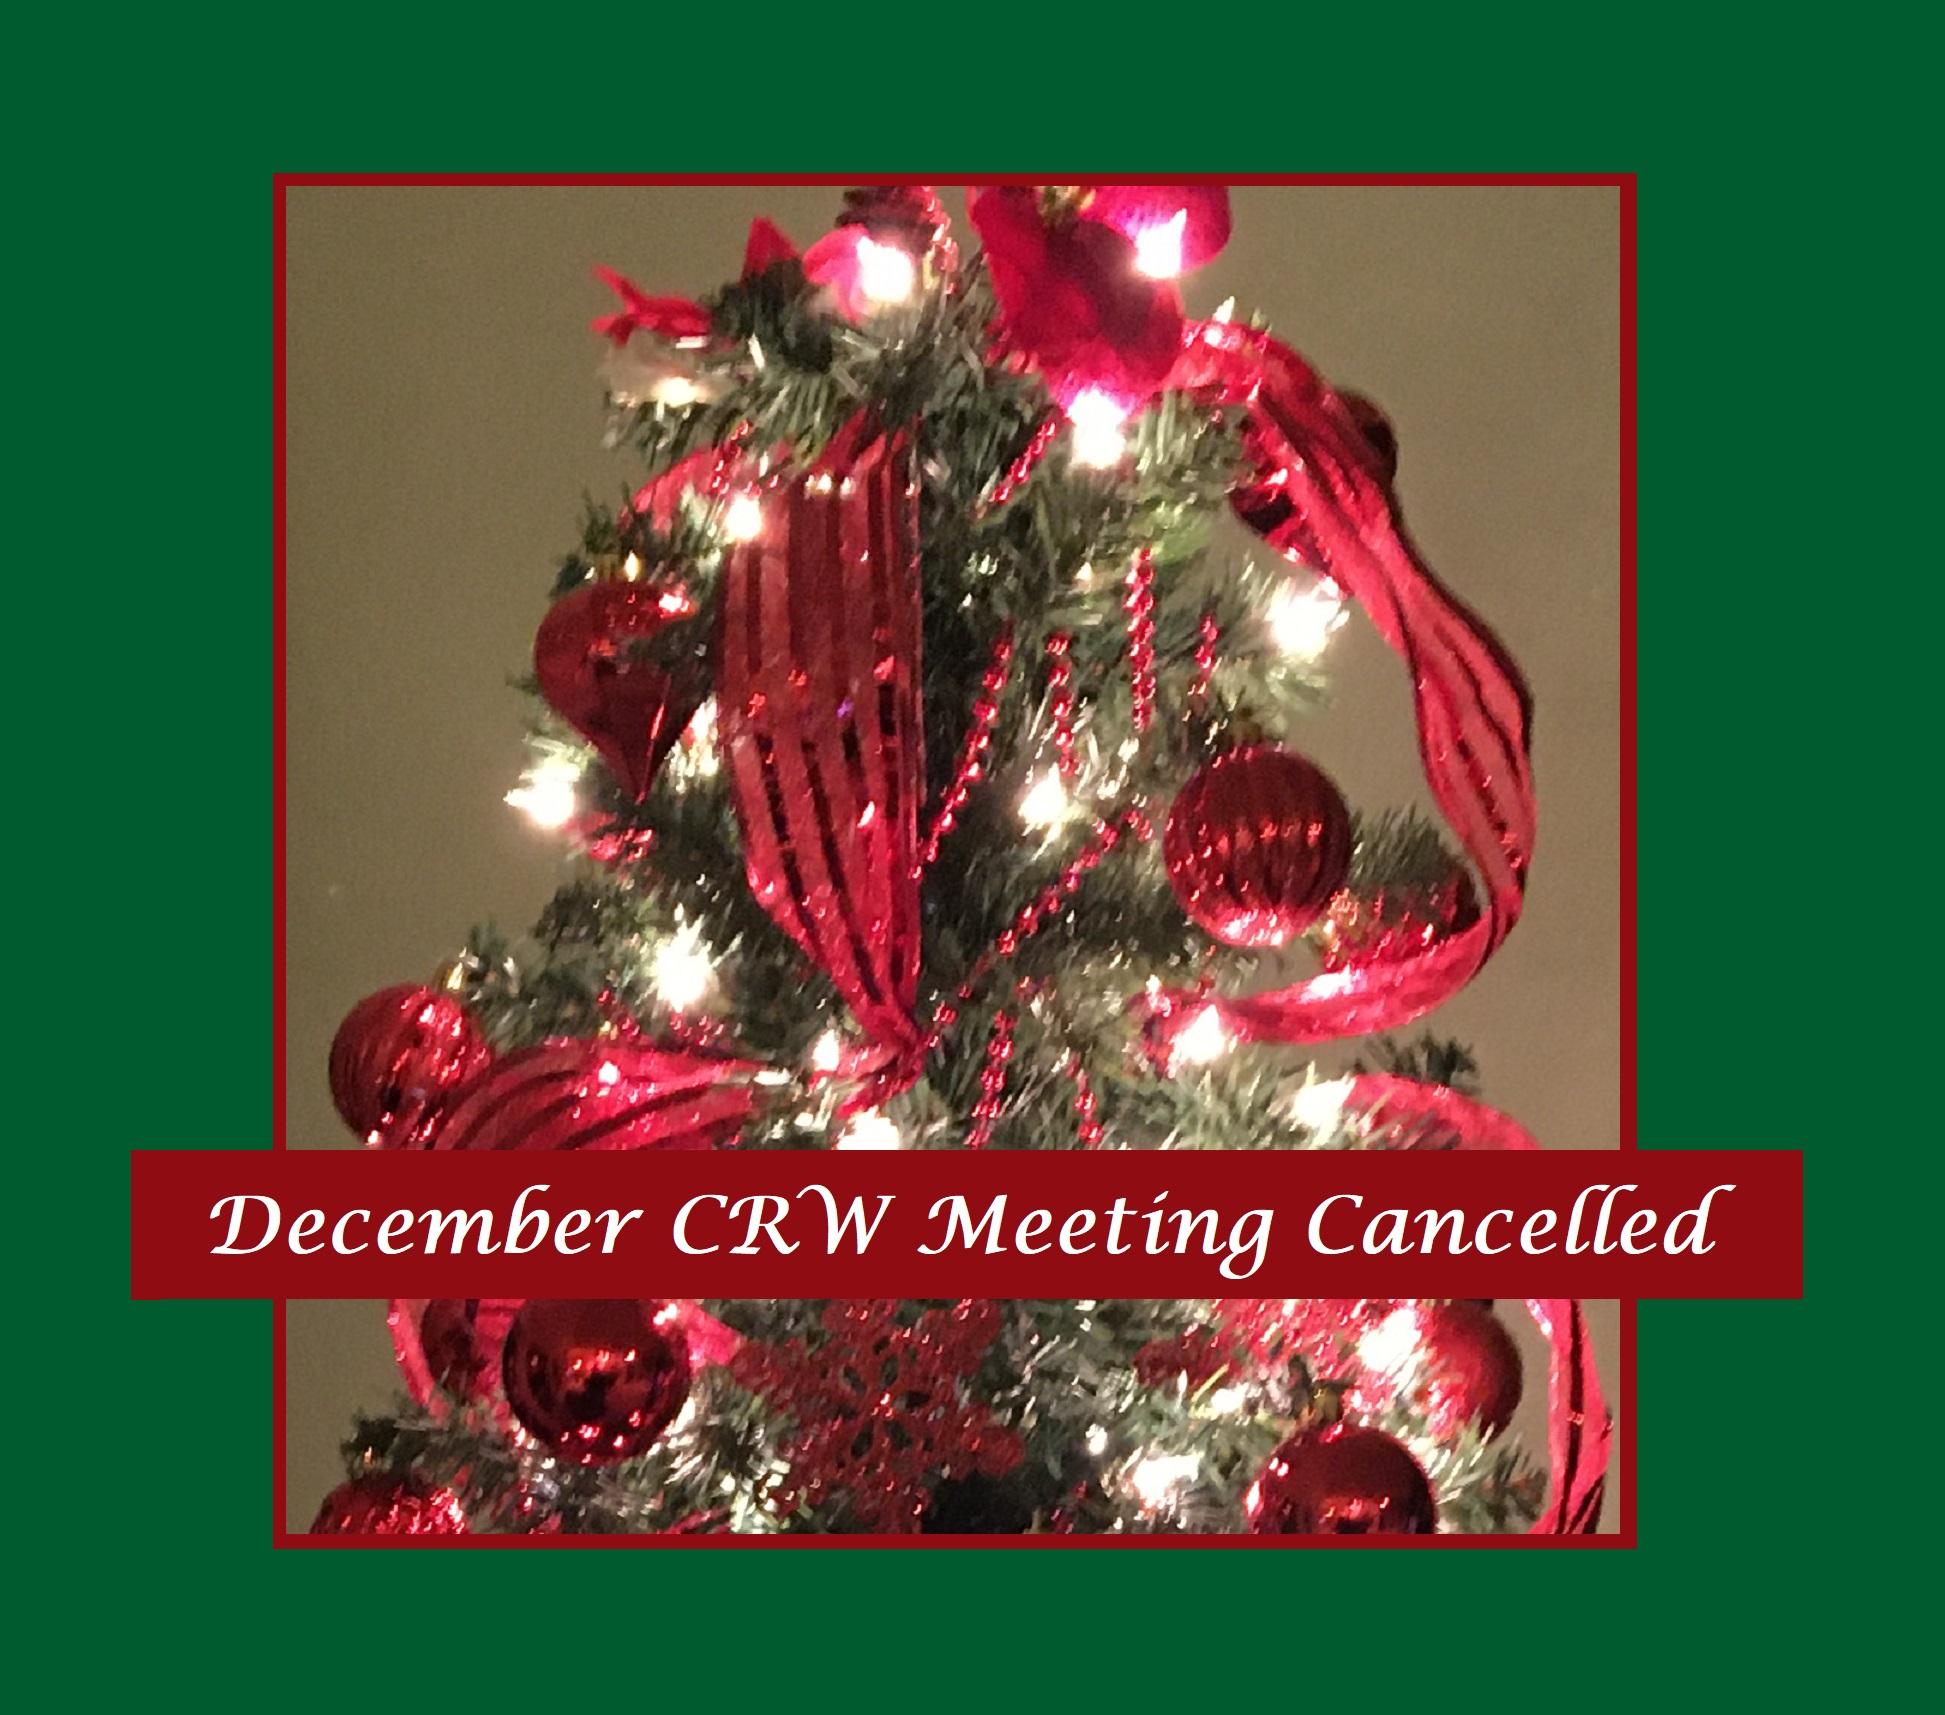 Dec CRW Meeting Cancelled